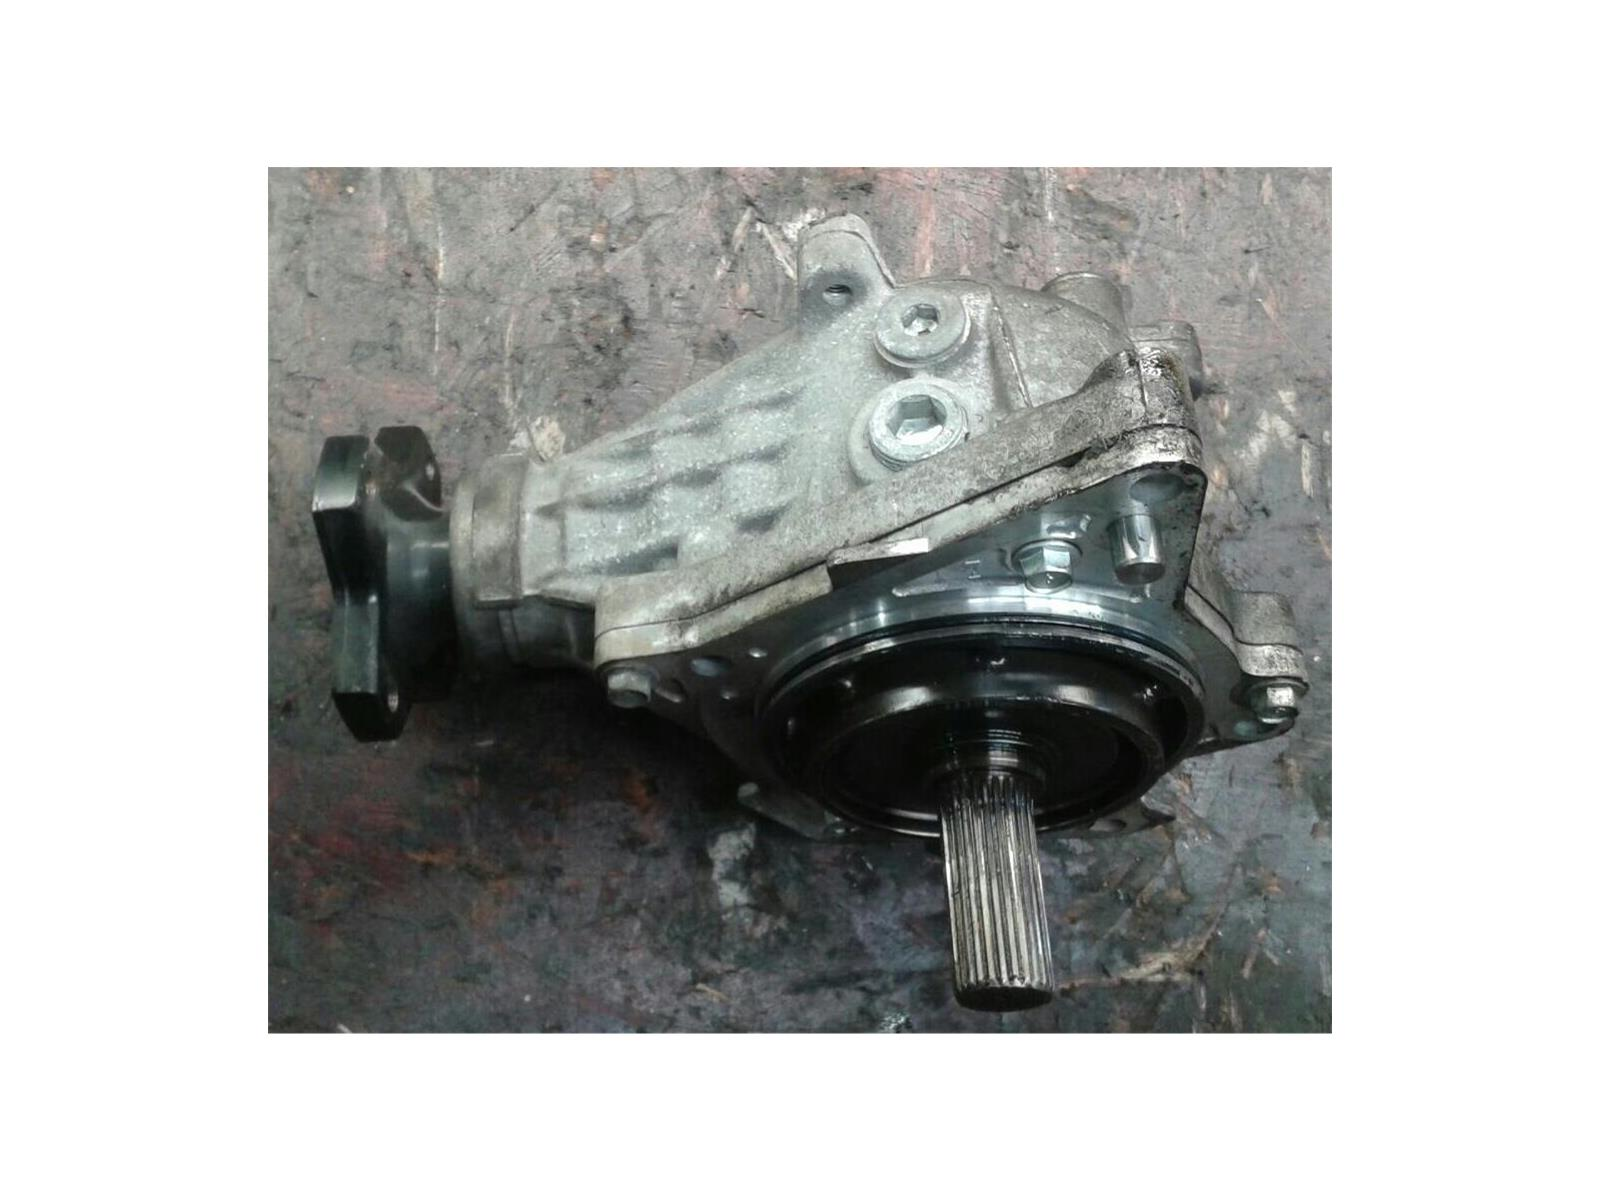 ... TRANSFER CASE 2008 On Renault Koleos 2.0 Diesel Transfer Box & WARRANTY  -5014973 ...